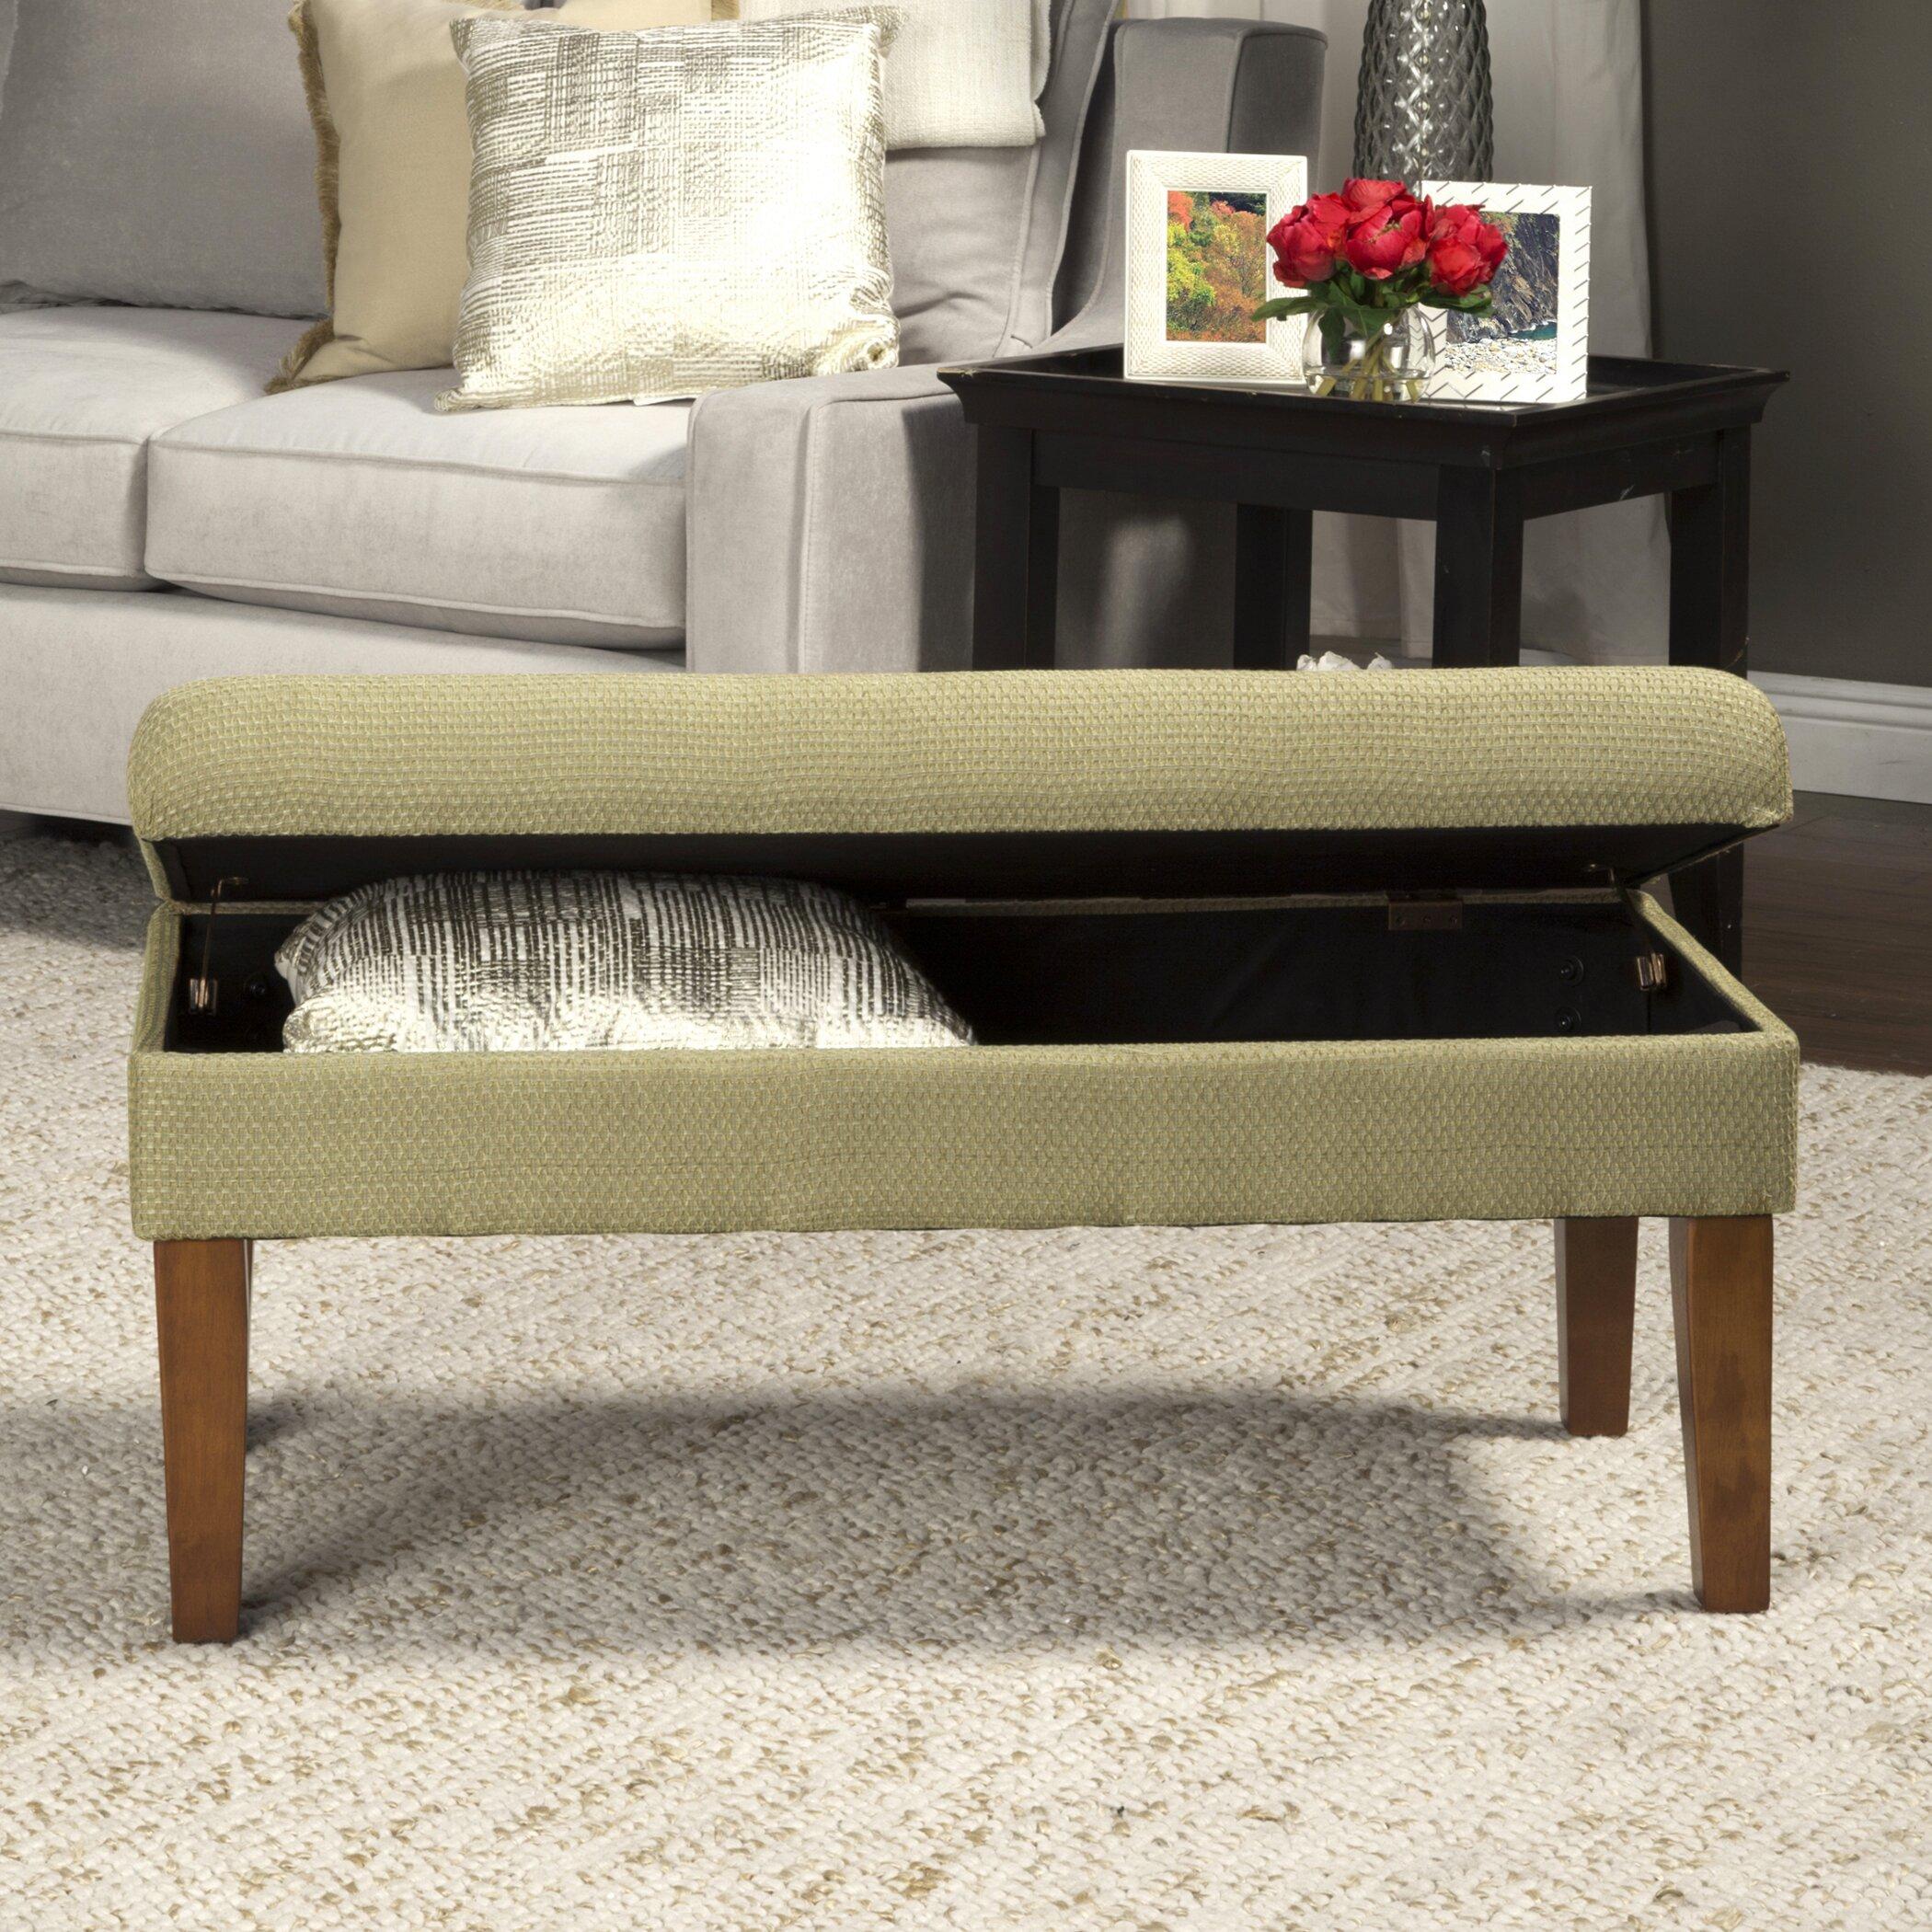 Homepop Kinfine Decorative Upholstered Bench Reviews Wayfair